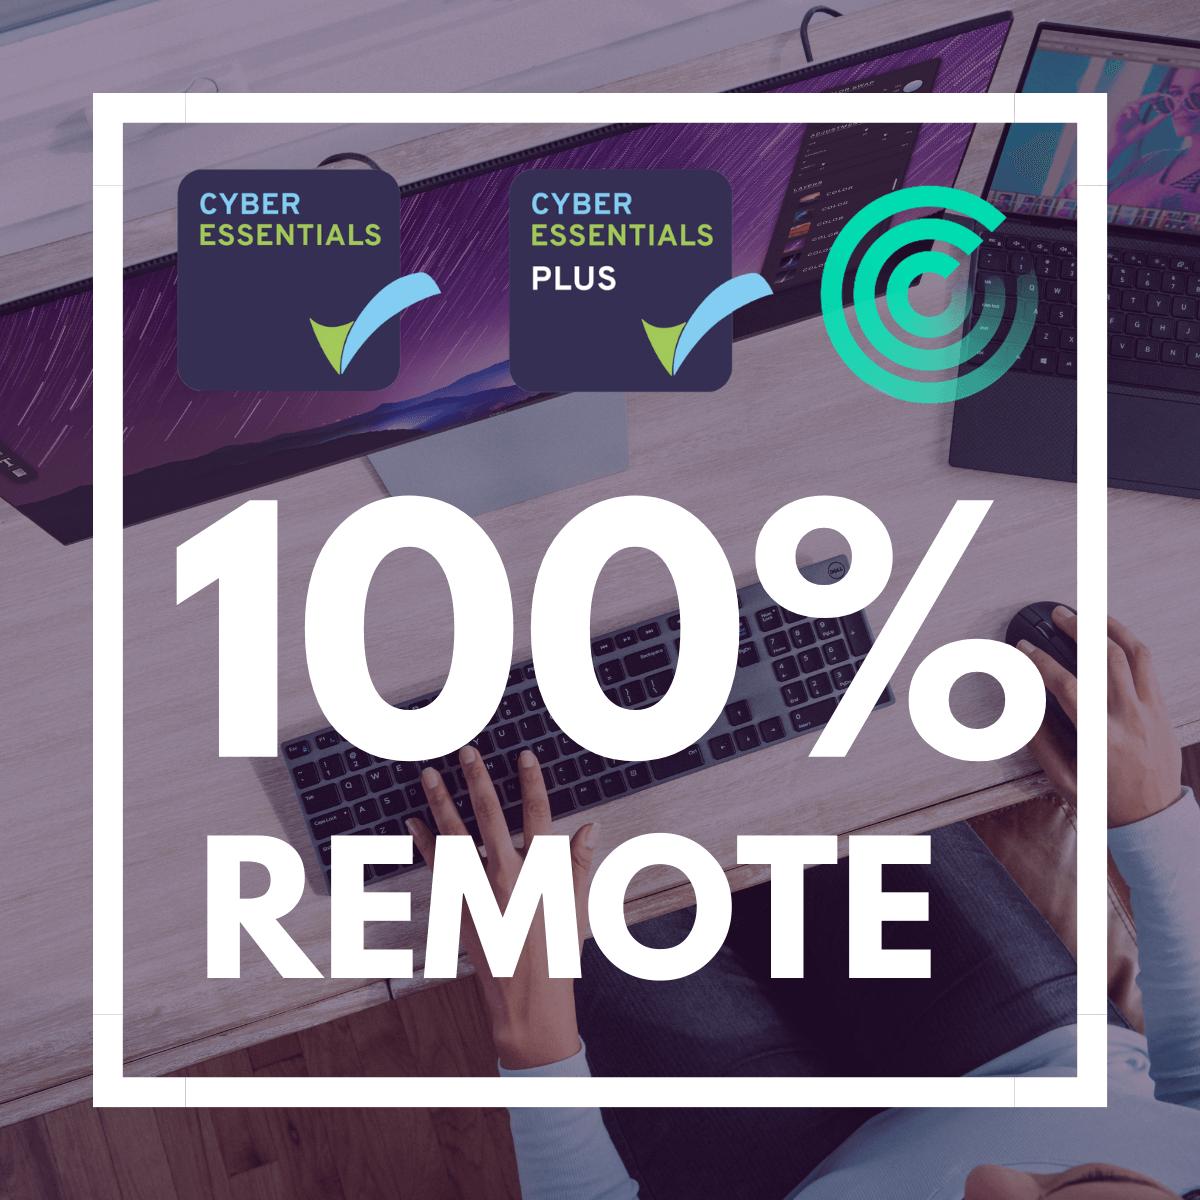 Cyber Essentials Plus - Now 100% Remote!